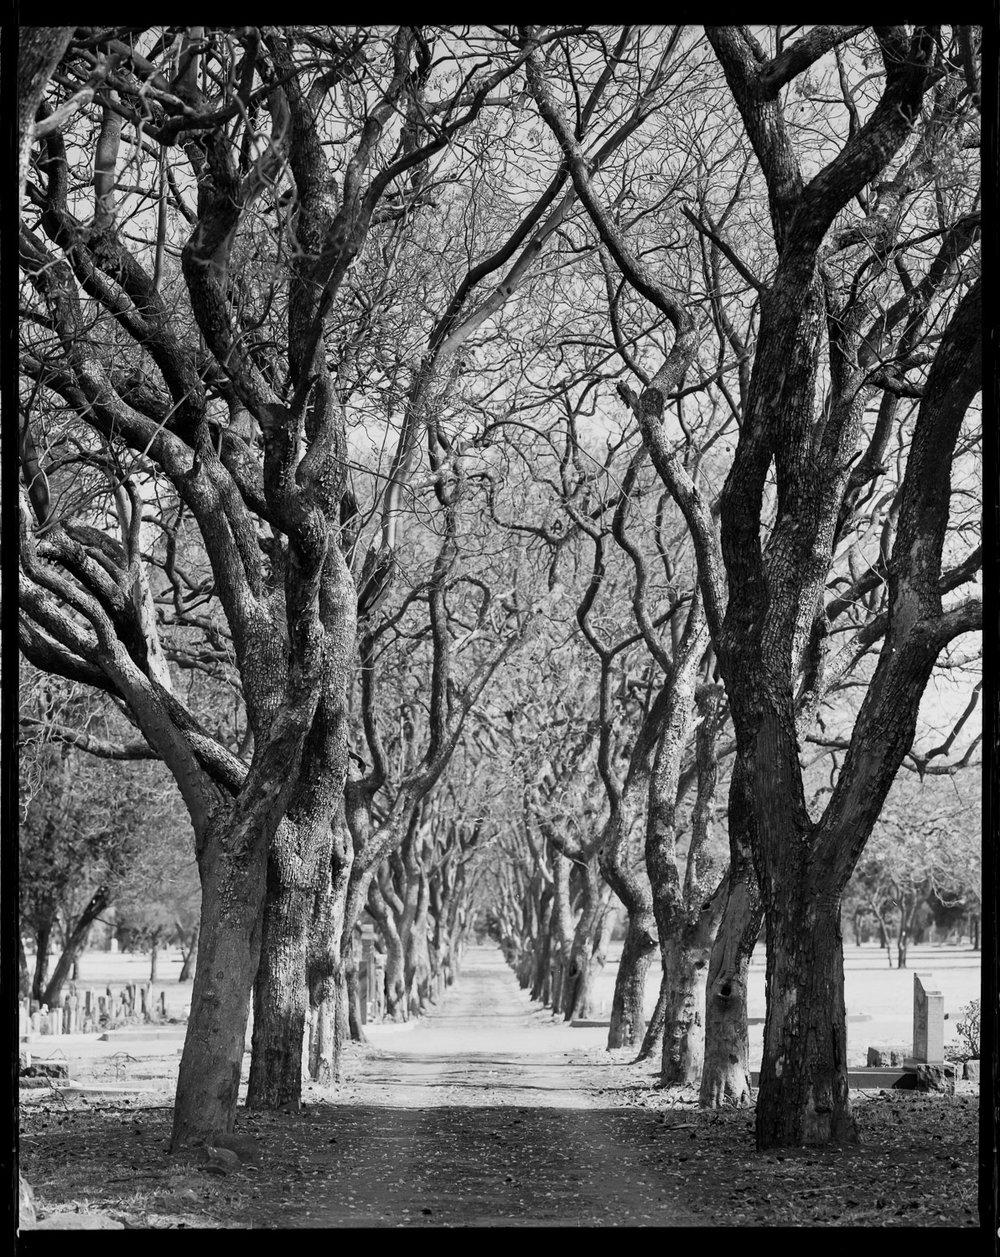 Jacaranda Trees in winter Mamiya RZ 67 Pro ii + 110mm Lens Ilford Delta 100